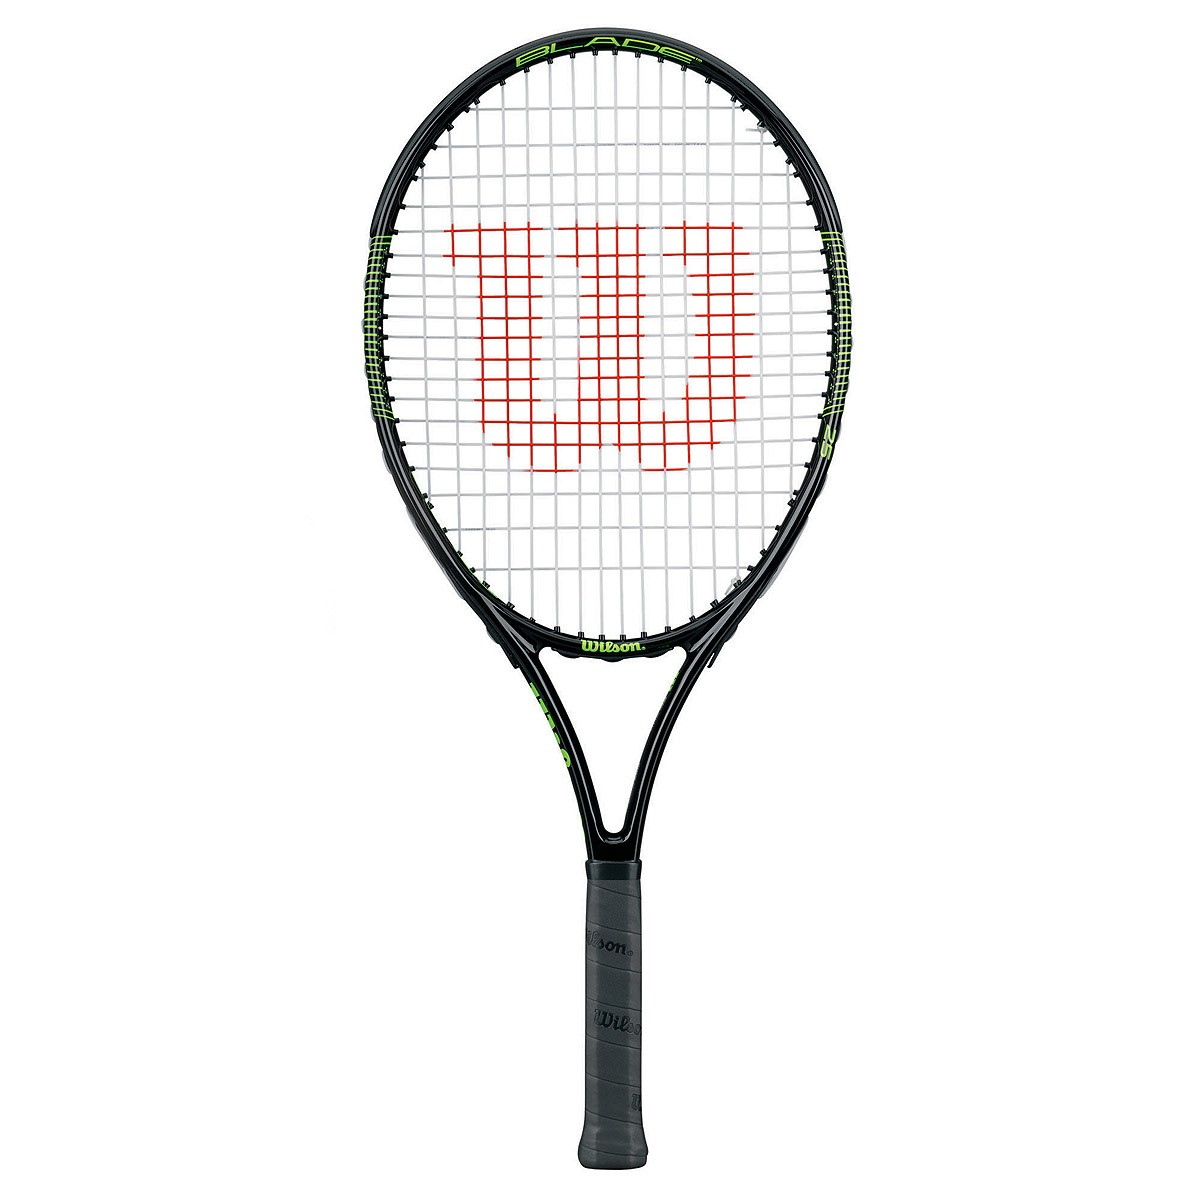 Rakieta tenisowa Wilson Blade 25